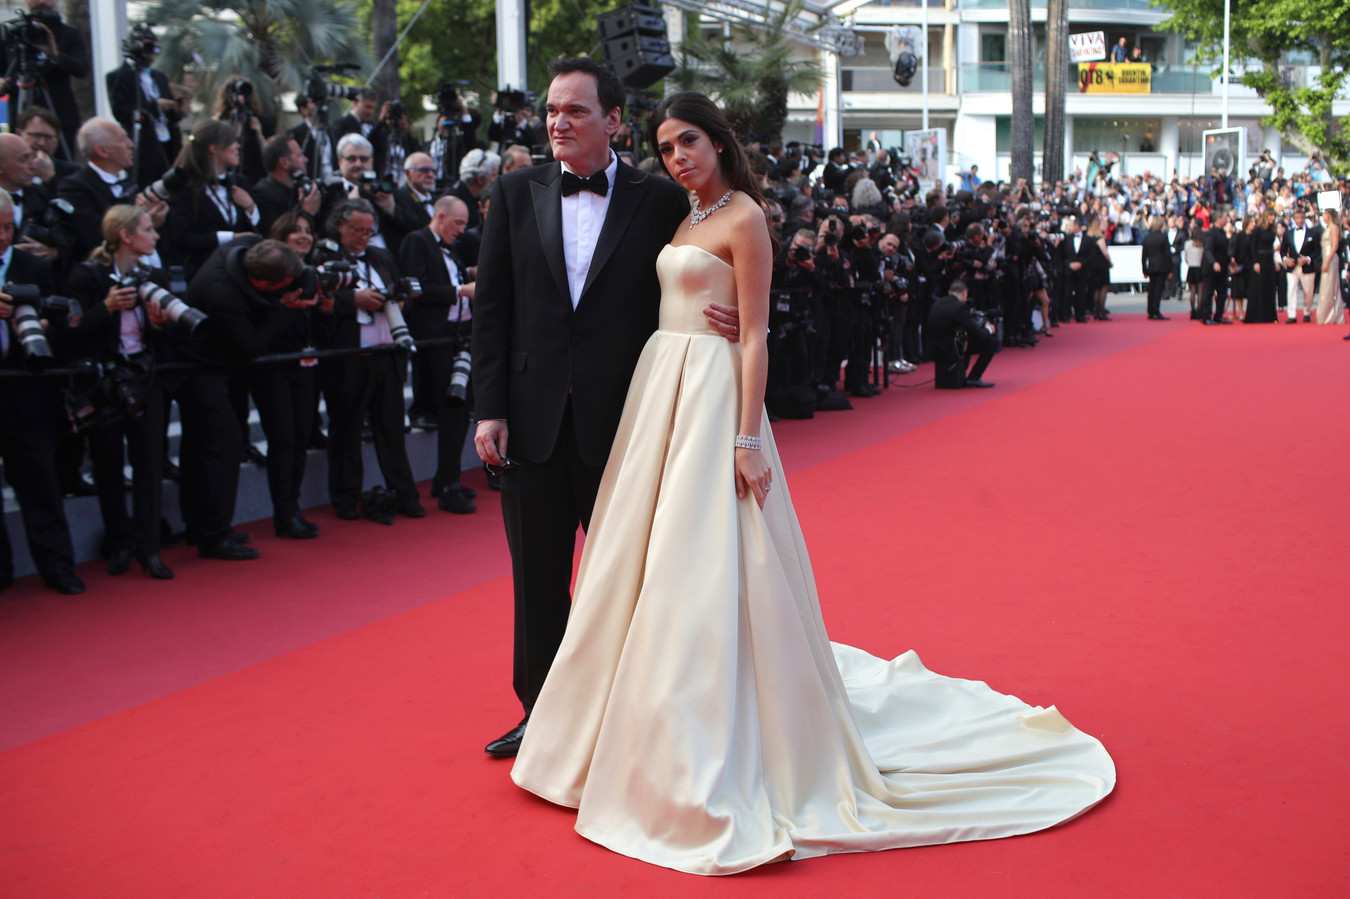 Quentin Tarantino et Daniela Pick